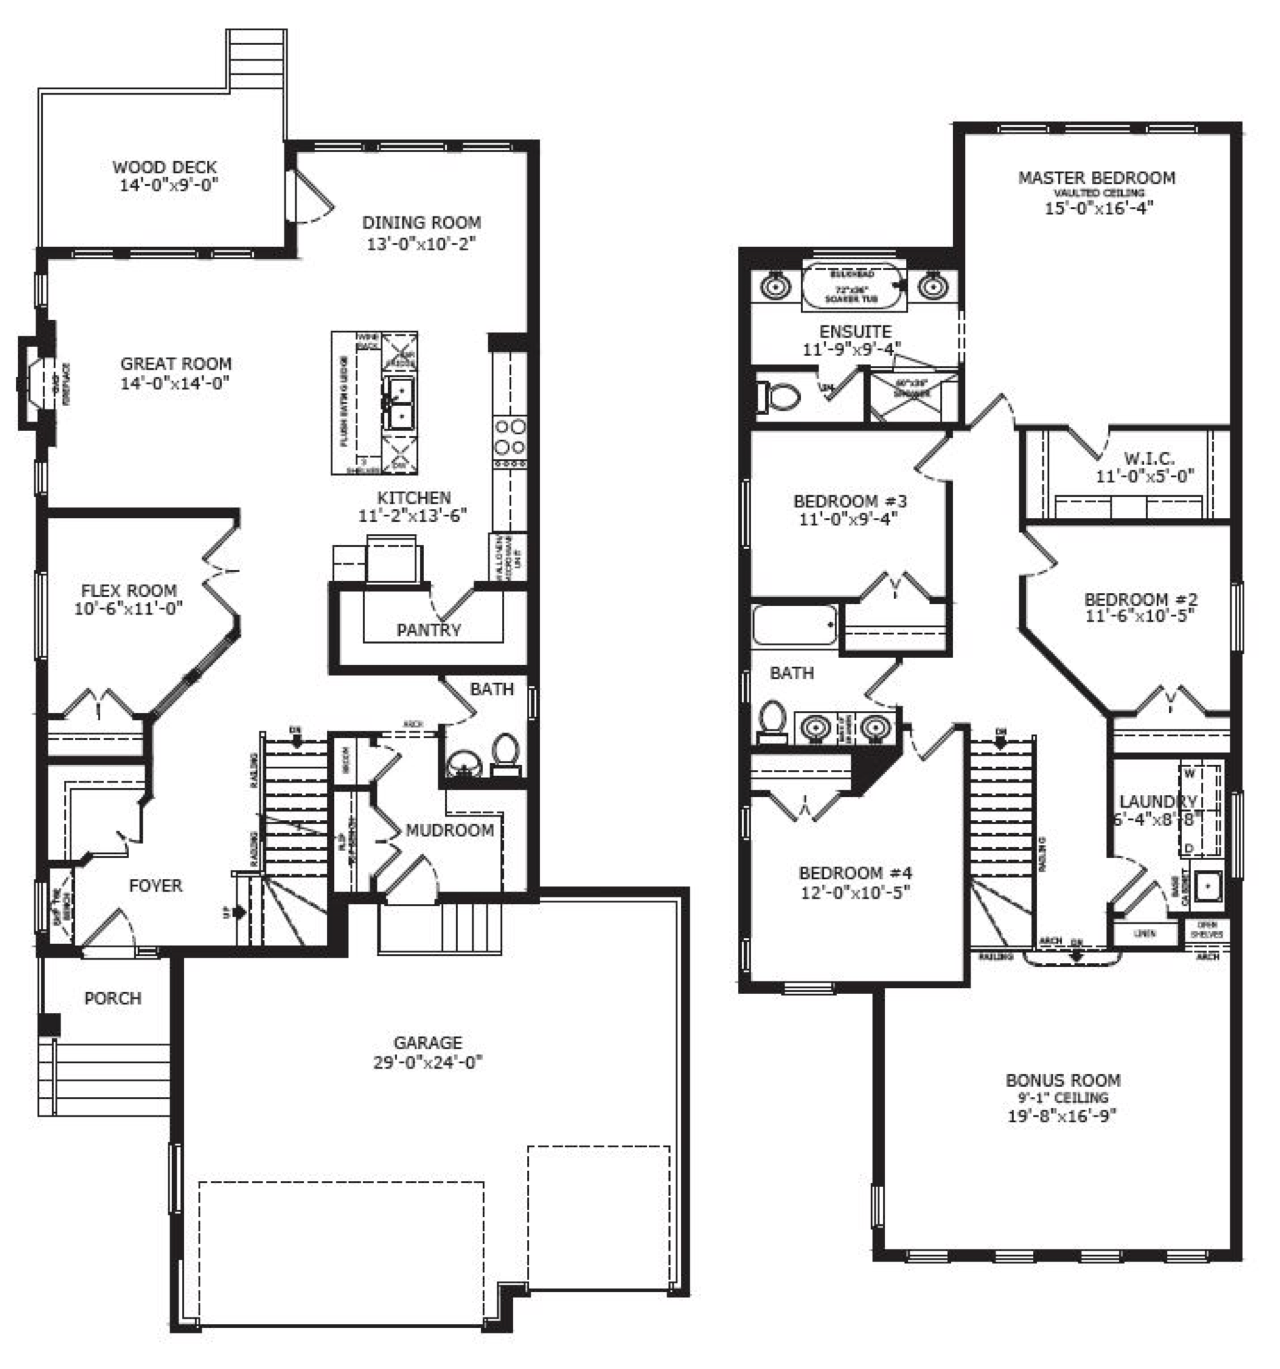 Quick Possession The Beaumont 2 Floorplan Image